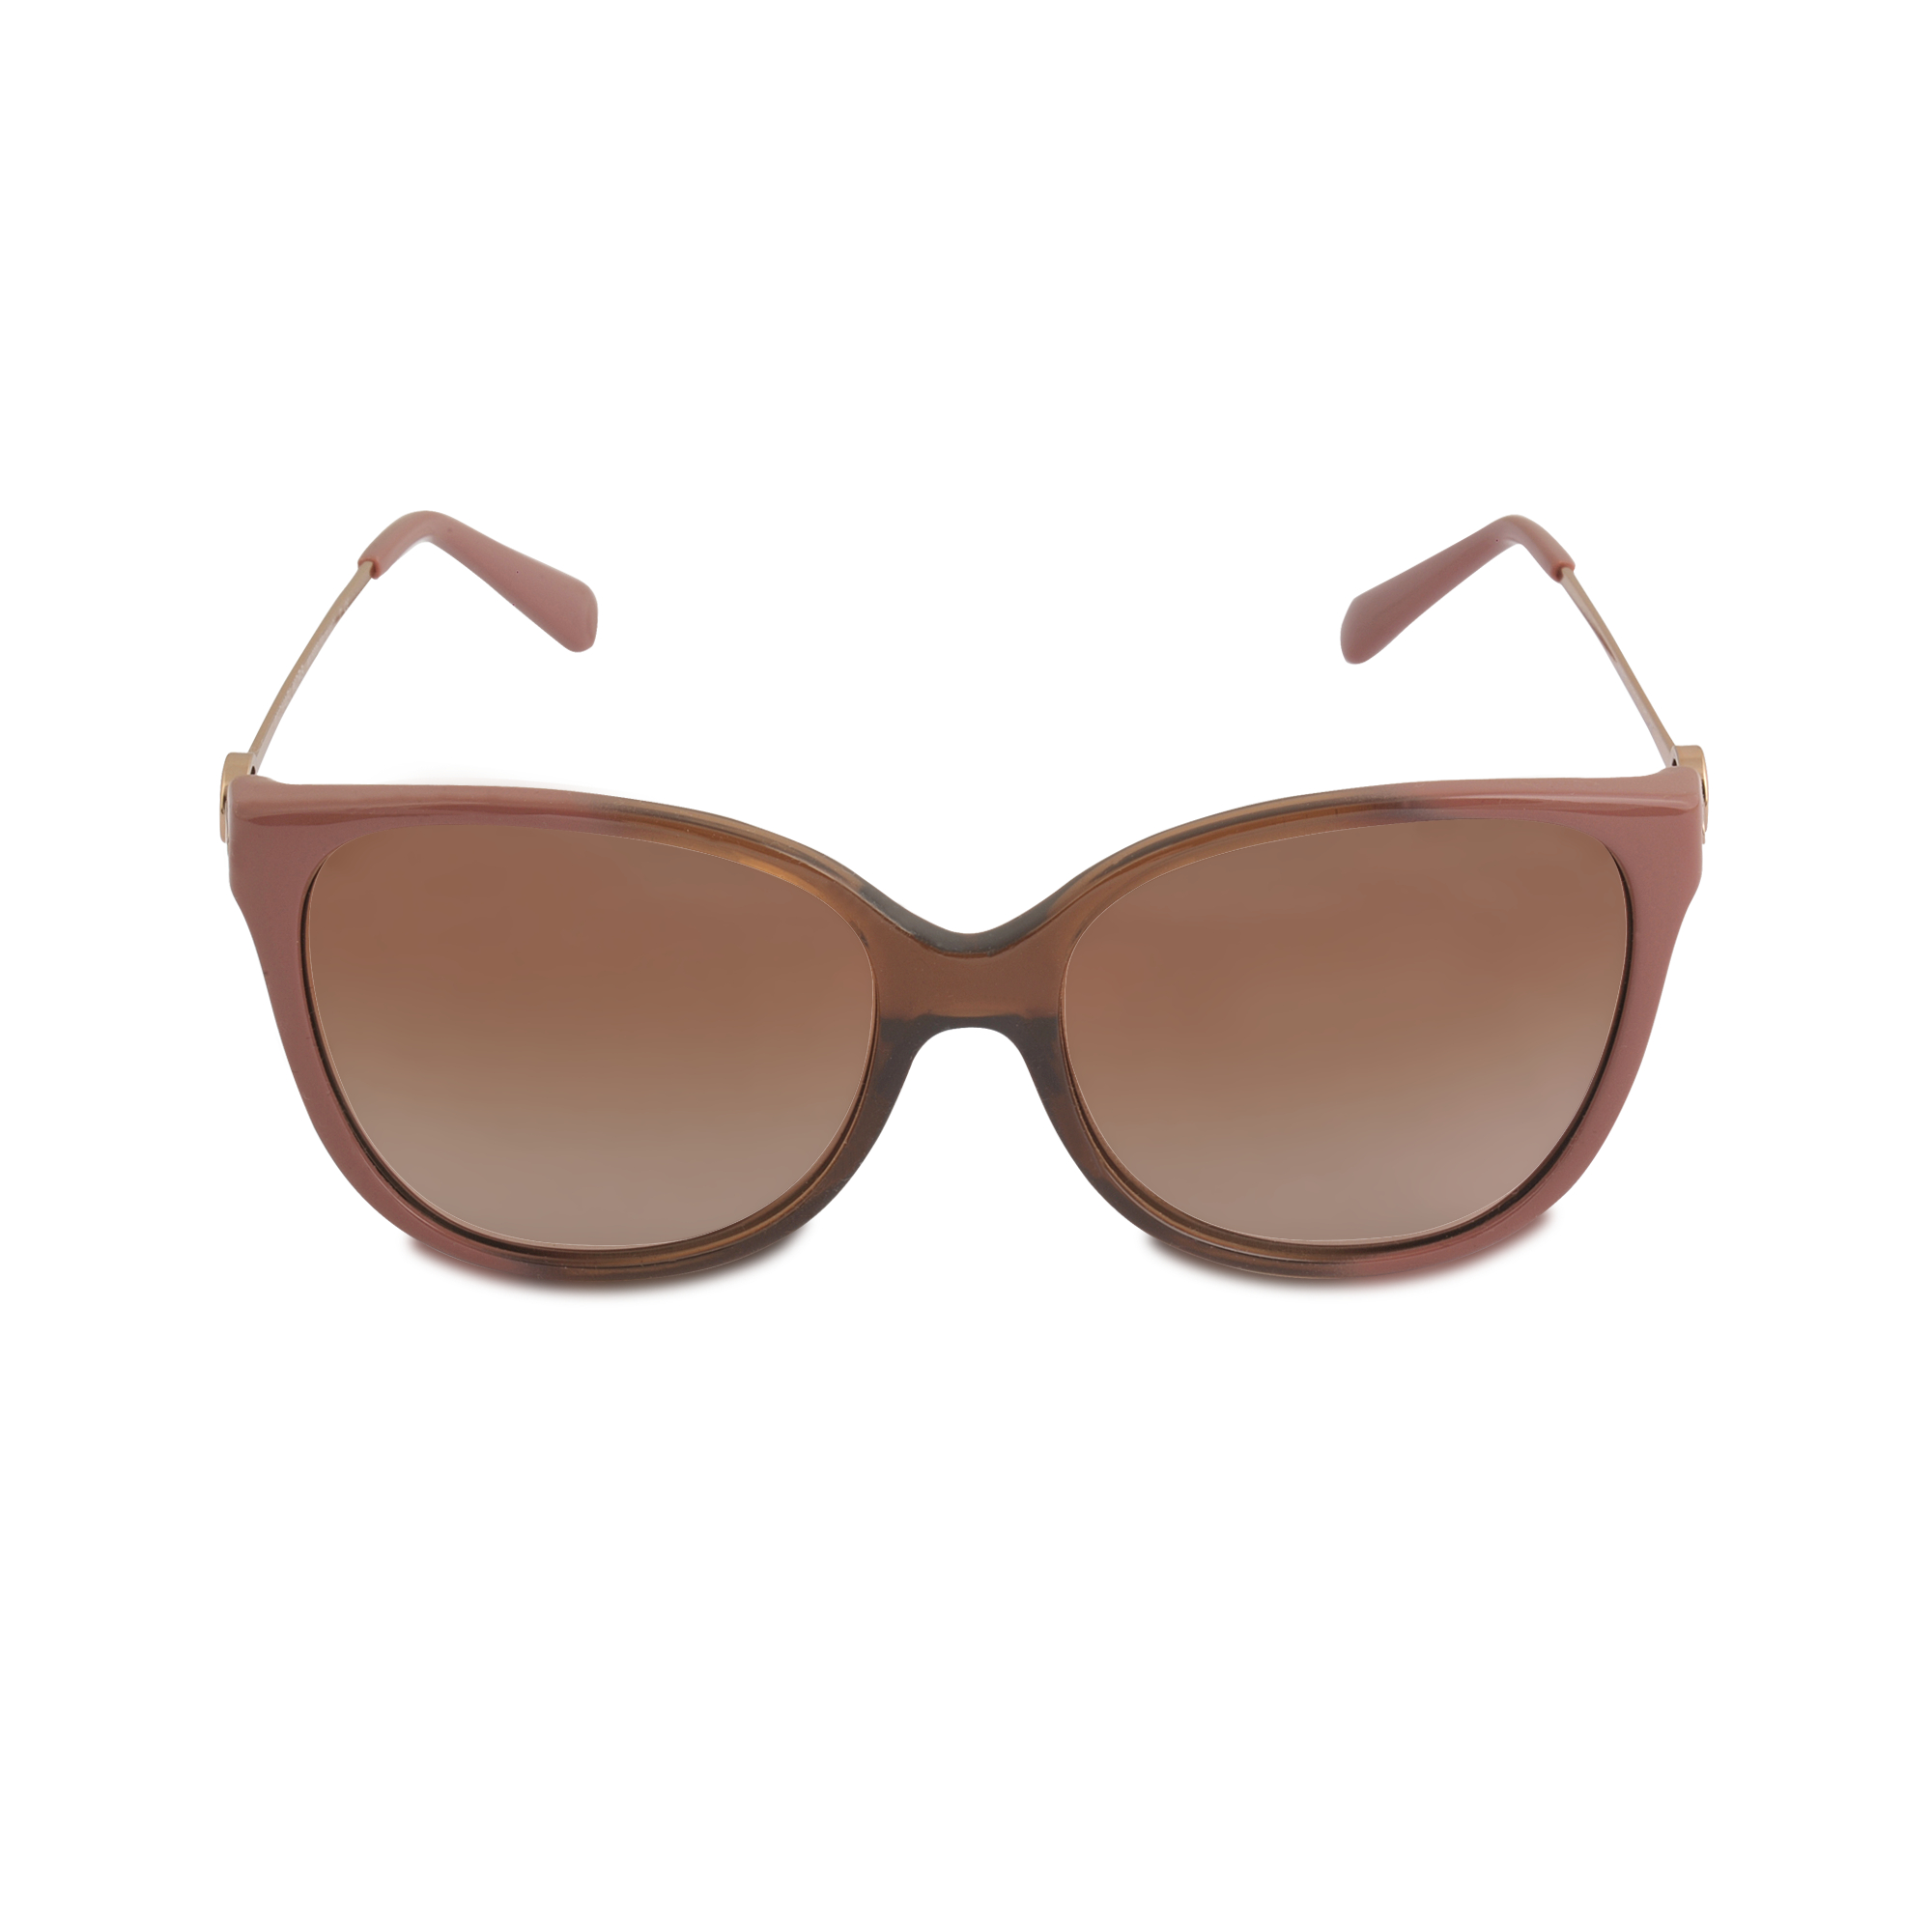 ee5f88b19f Michael michael kors Brown-rio Coral Ombre Sunglasses Mk6006 in Brown